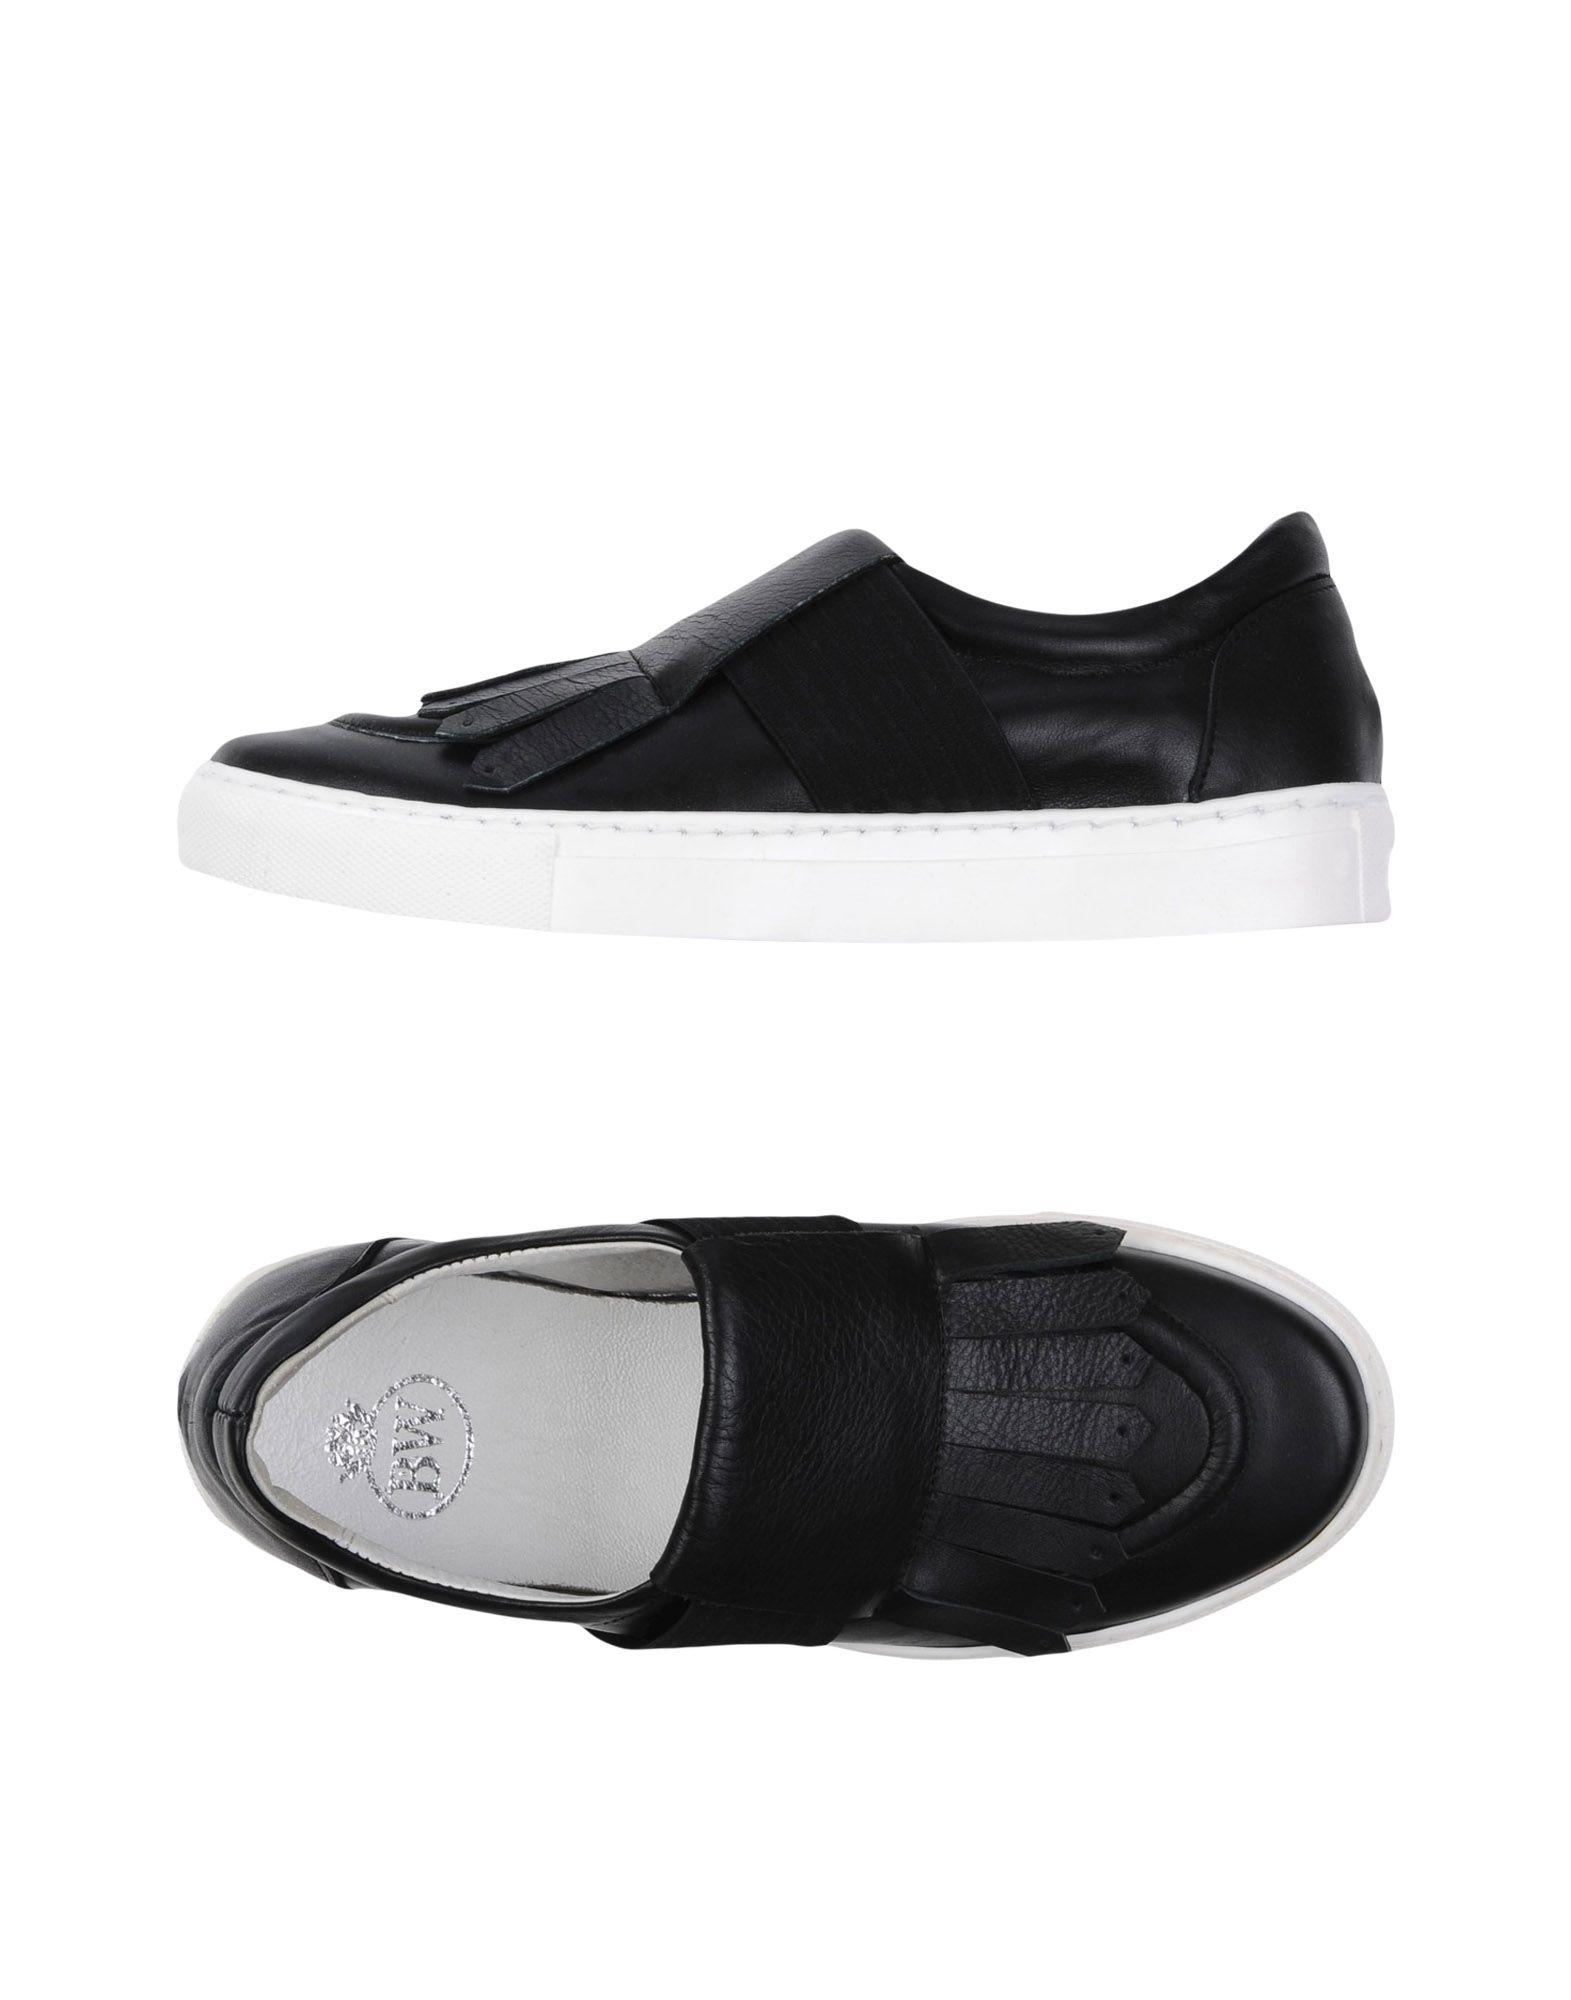 Brawn's Sneakers Damen  beliebte 11279736IC Gute Qualität beliebte  Schuhe 7ca435